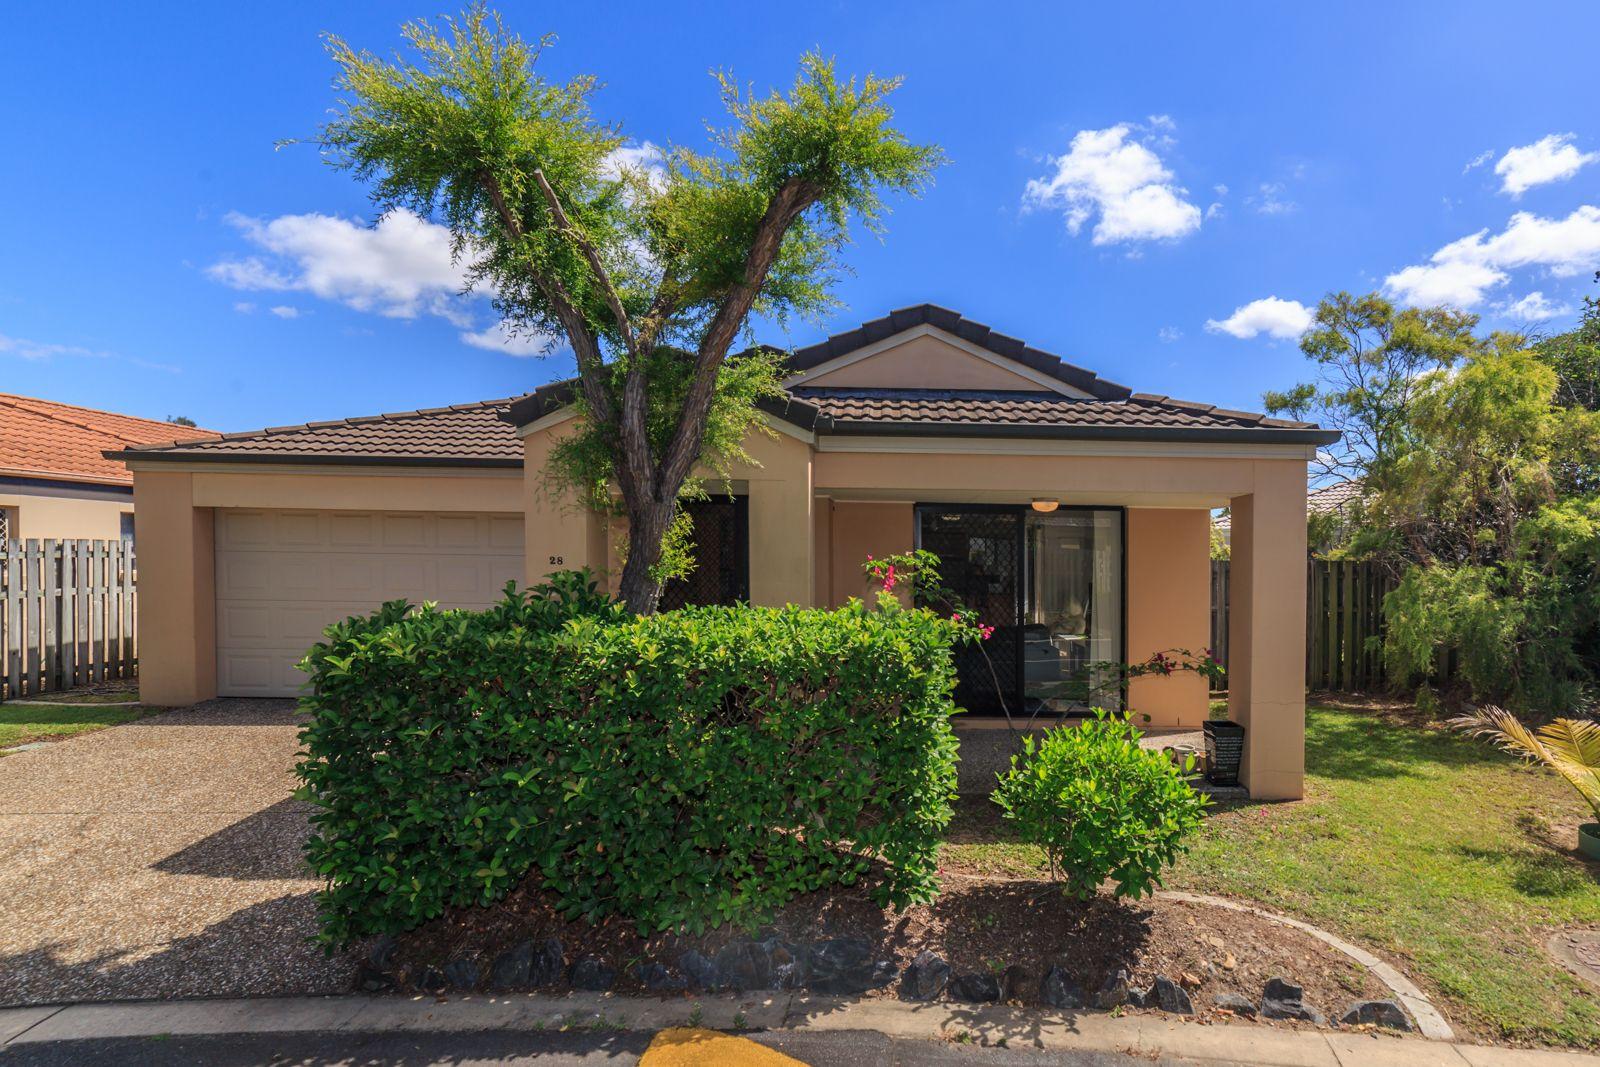 28/107-111 Arundel Drive, Arundel QLD 4214, Image 0